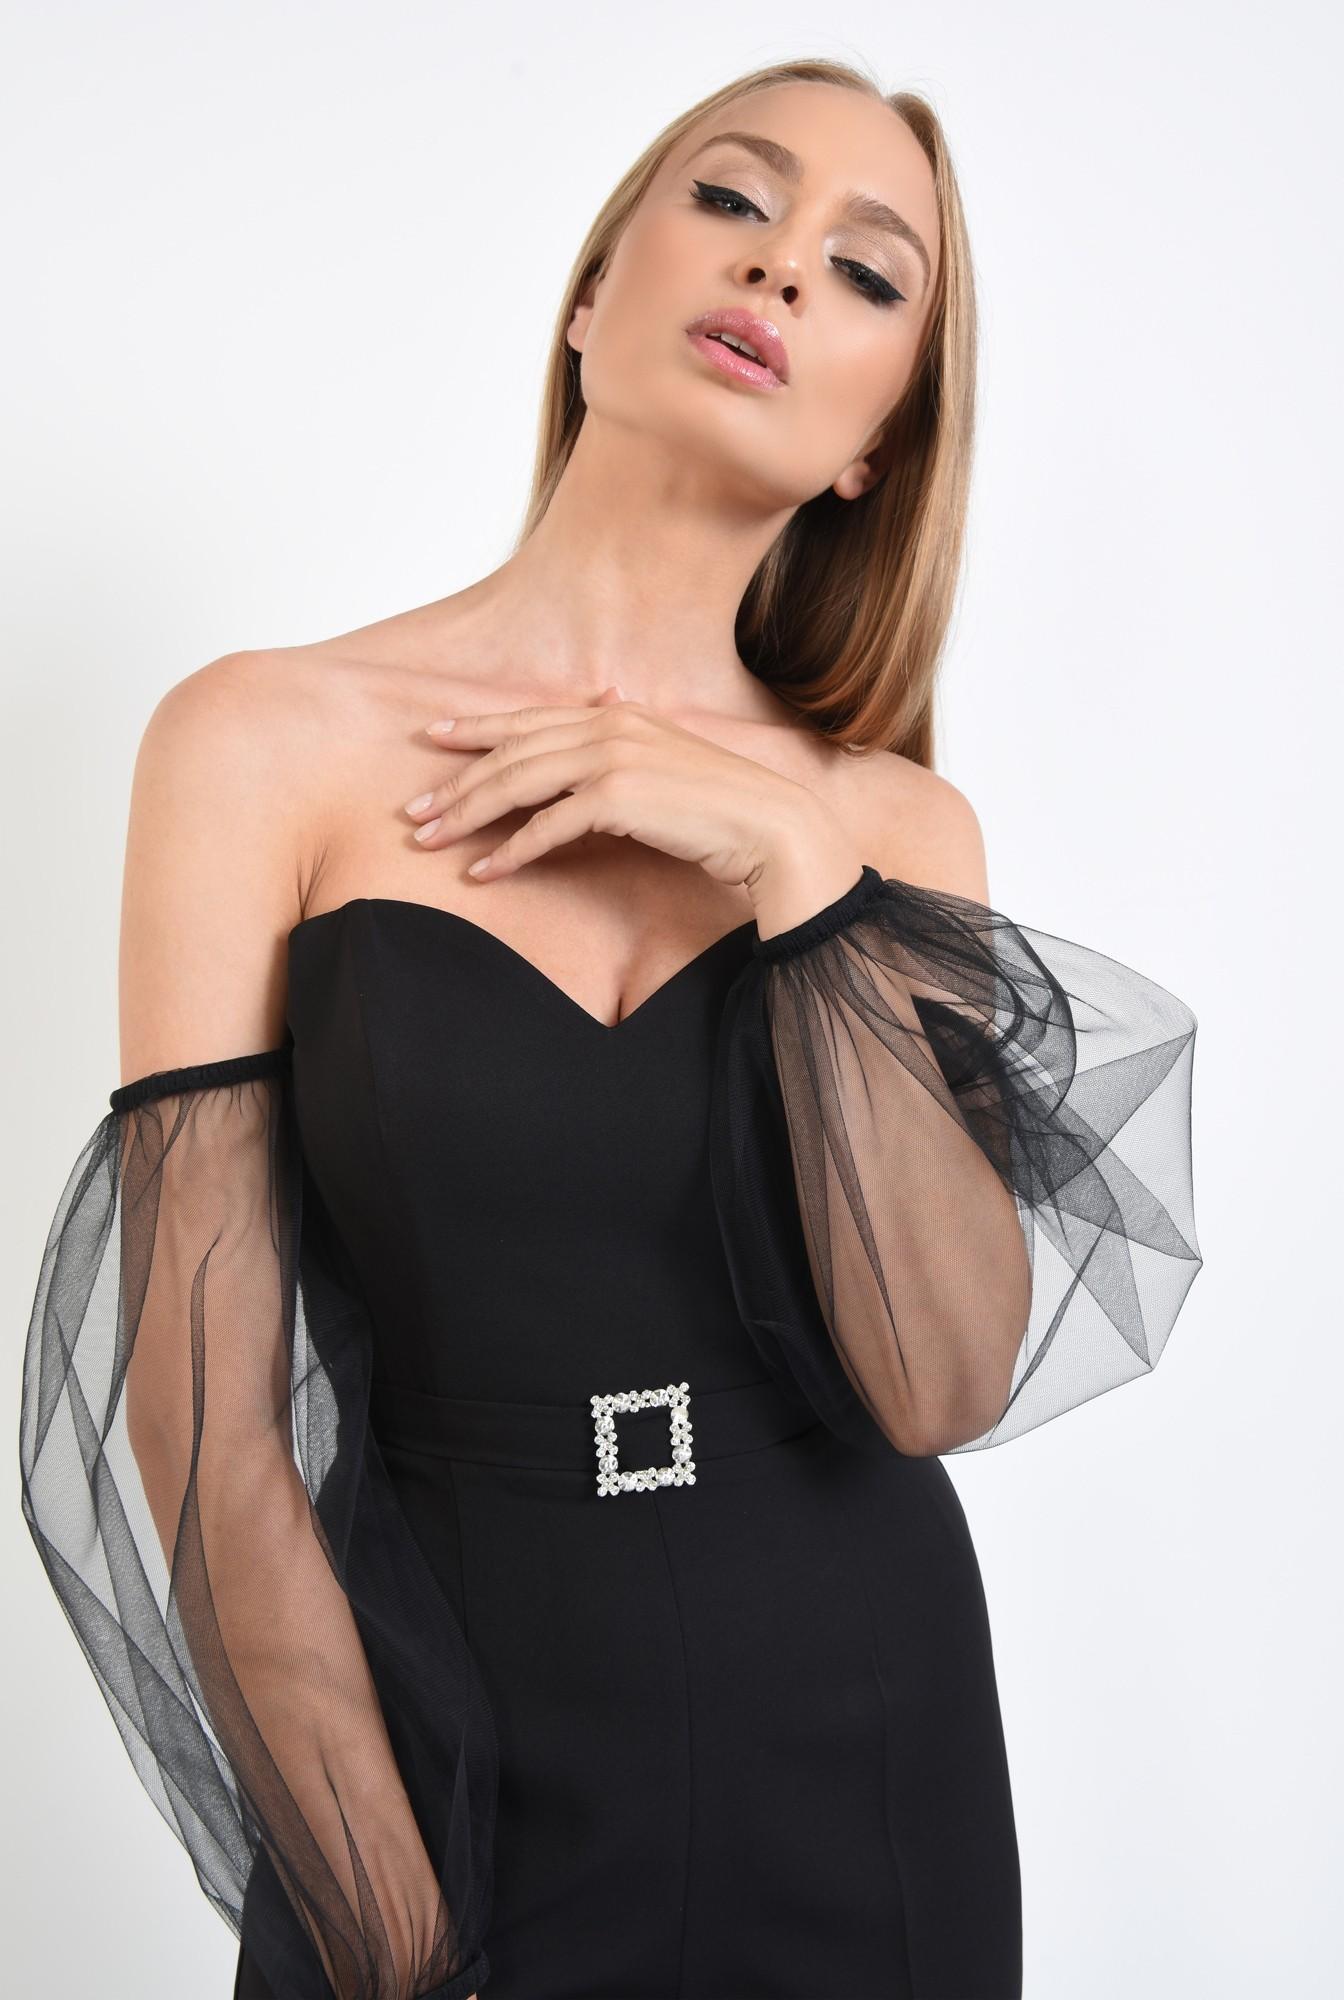 2 - salopeta eleganta, maneci tul, corset, centura decorativa